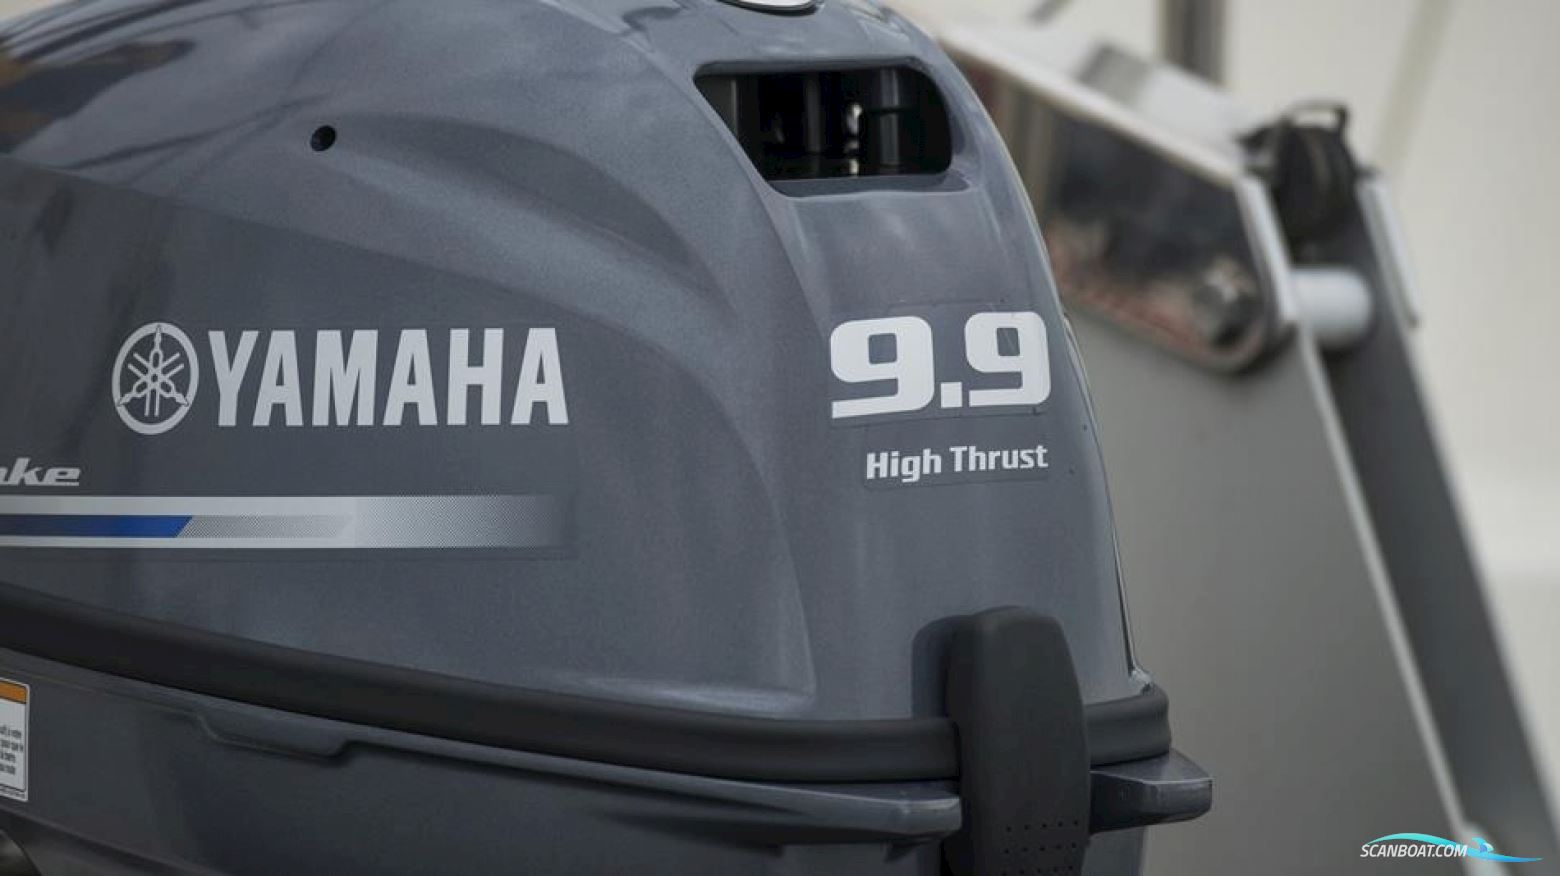 Yamaha FT9.9Lepl High Thrust